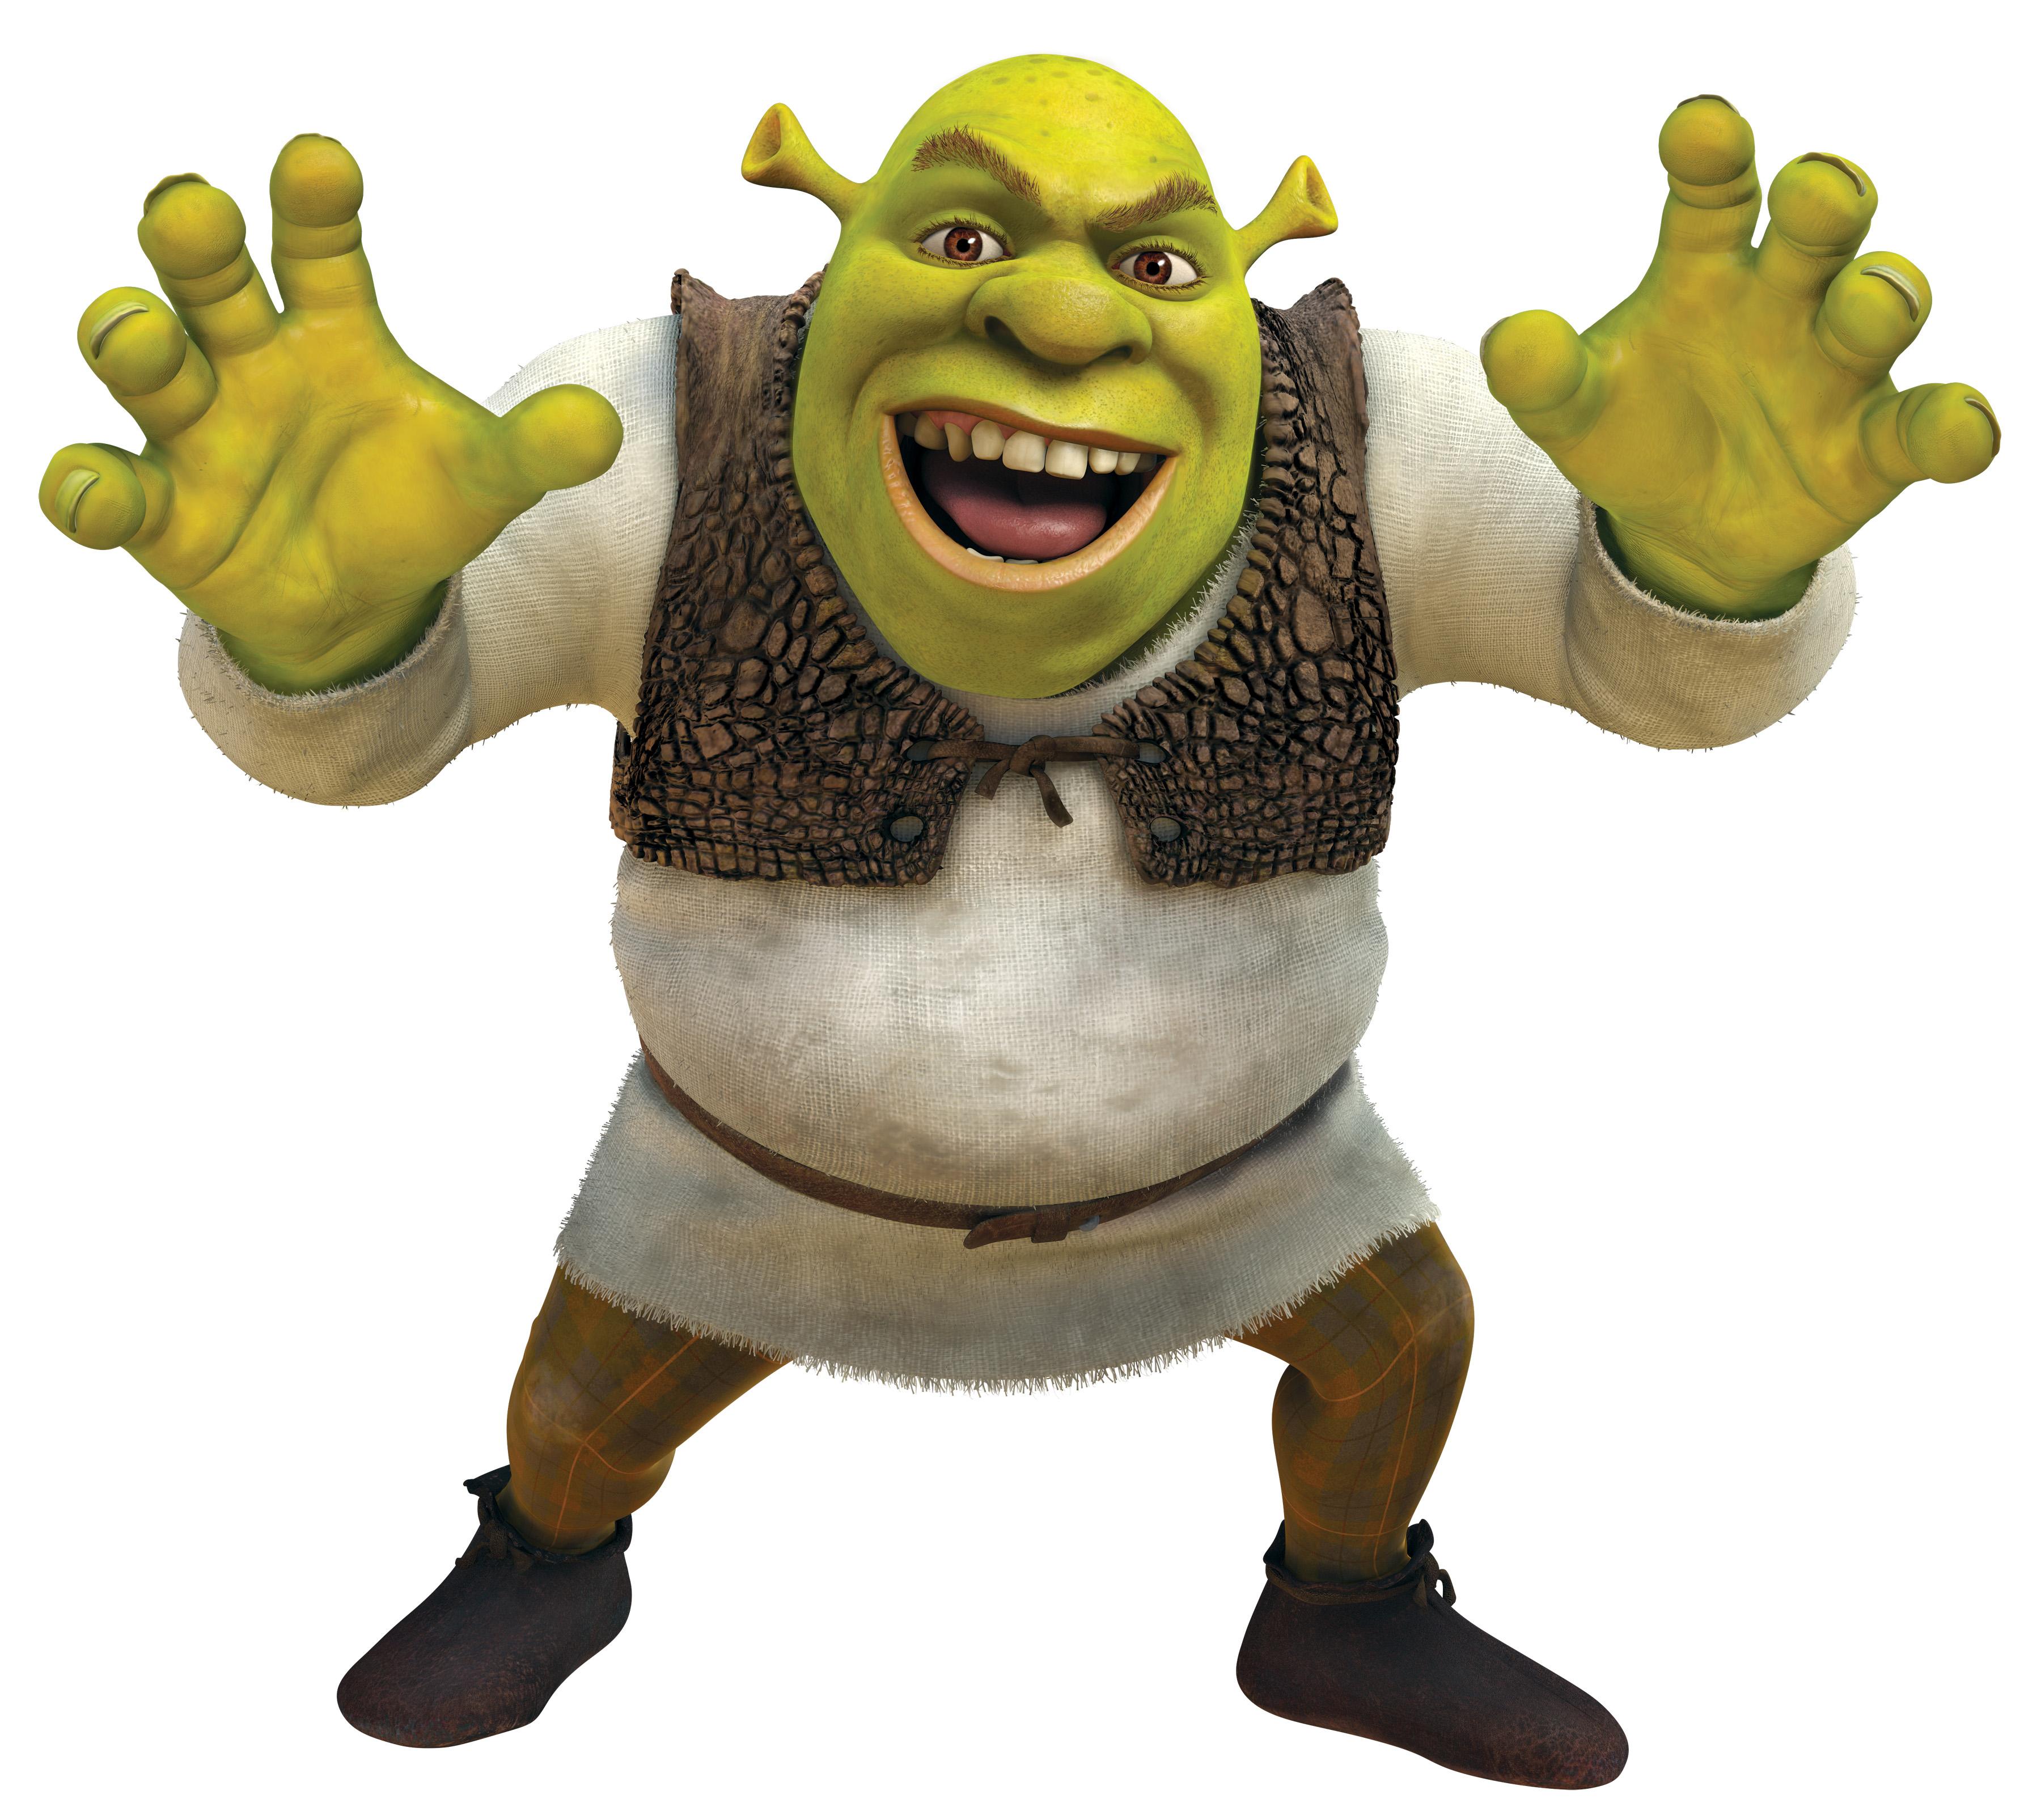 http://images1.wikia.nocookie.net/__cb20100604223617/shrek/images/8/87/Shrek_fierce.jpg